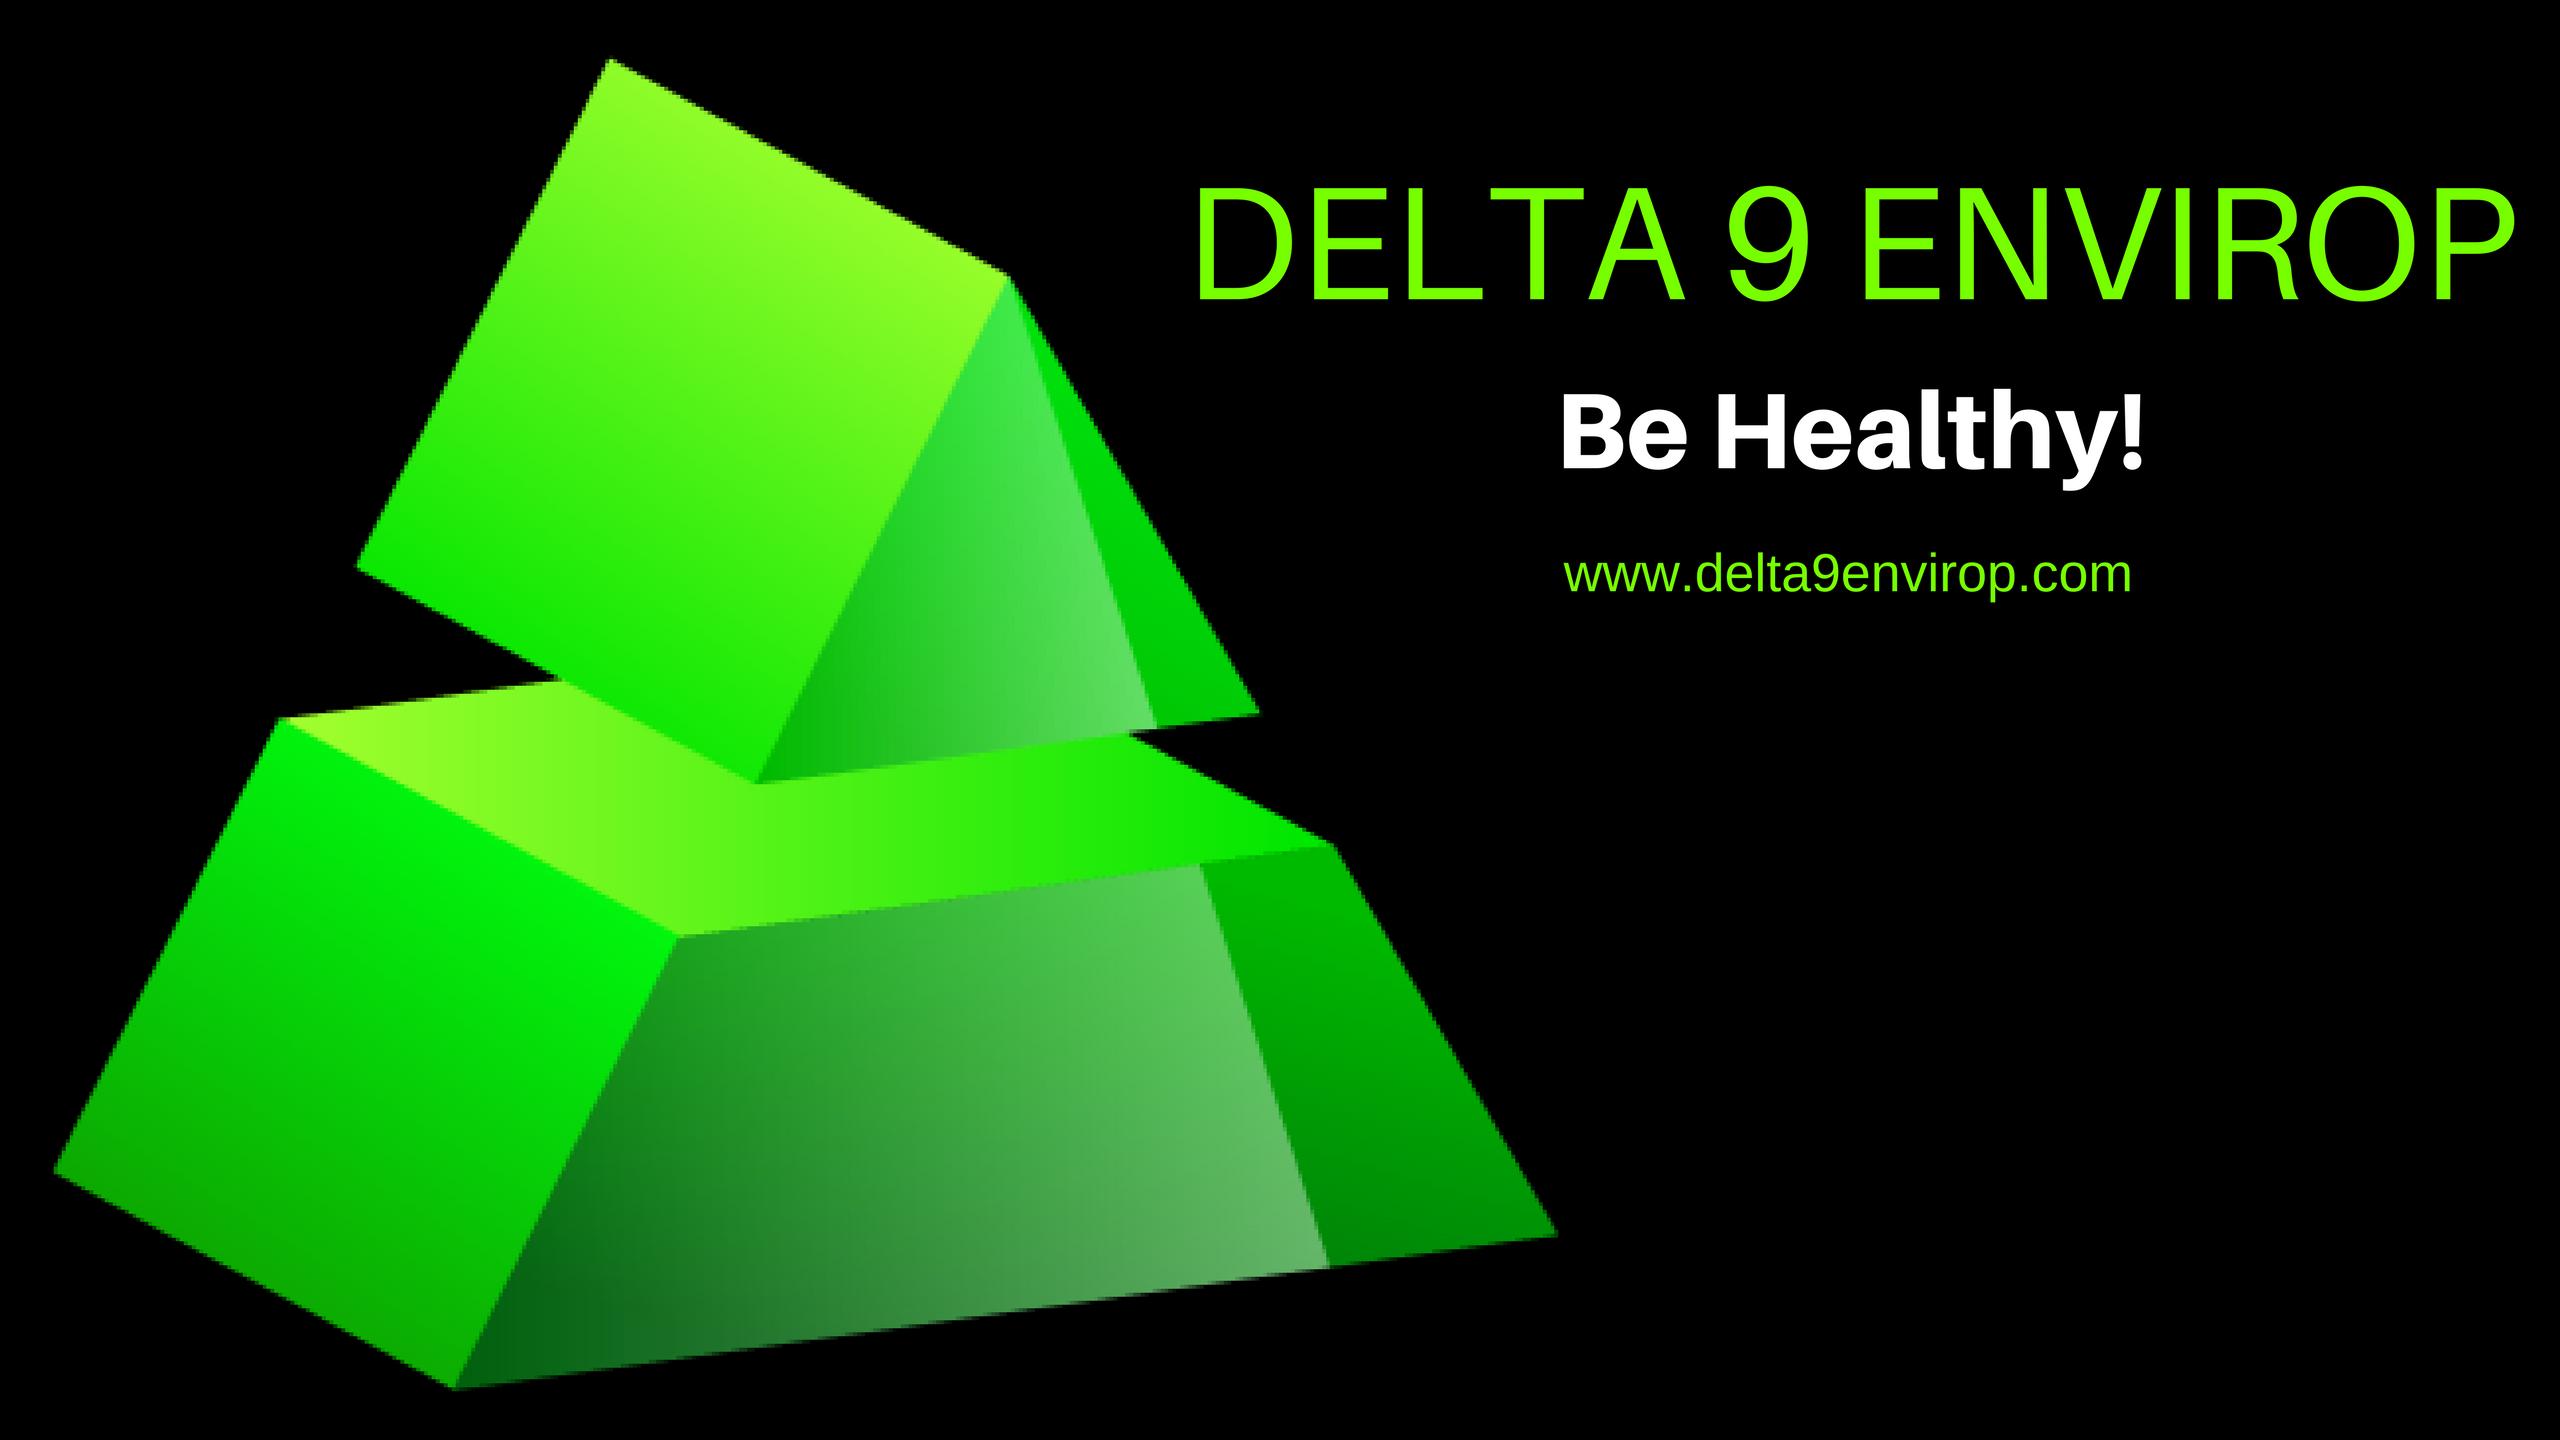 DELTA 9 ENVIROP logo banner2